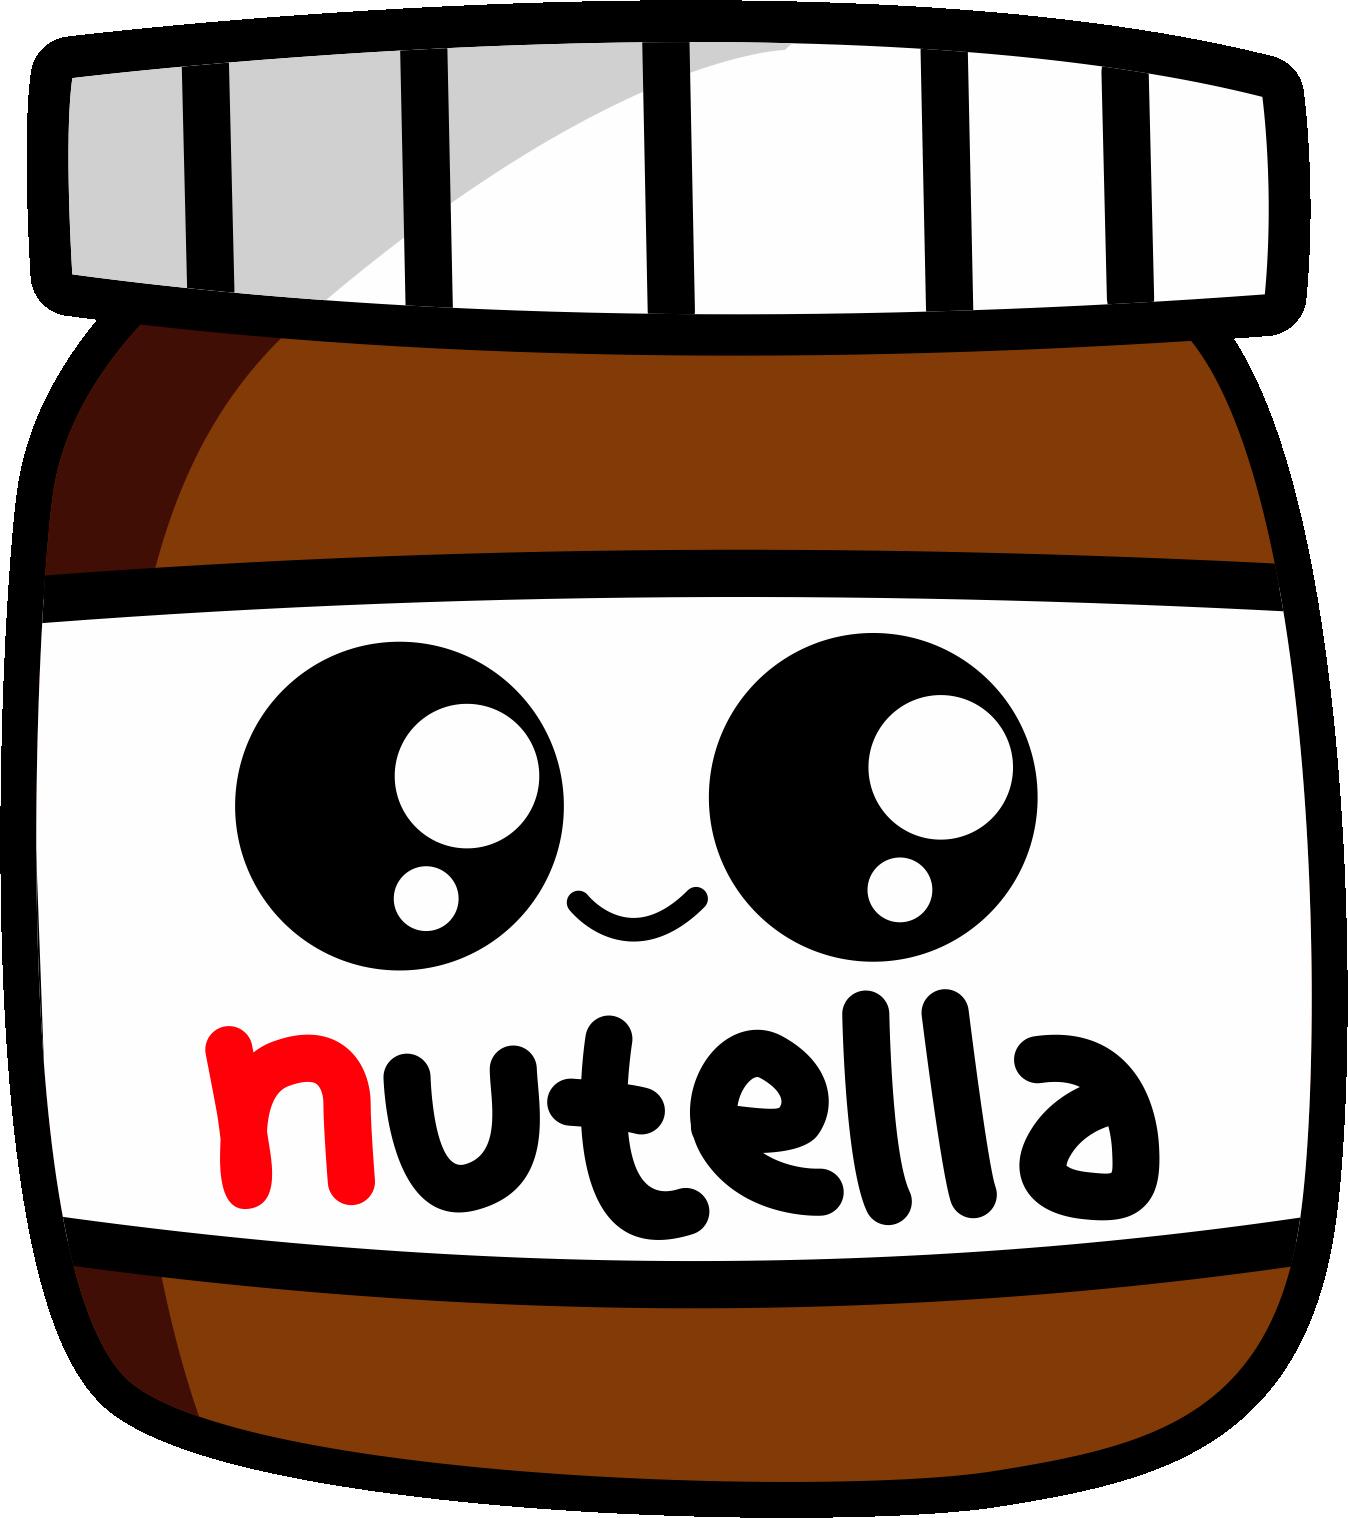 25 Imagens Png Luccas Neto Nutella Png Fundo Transparente